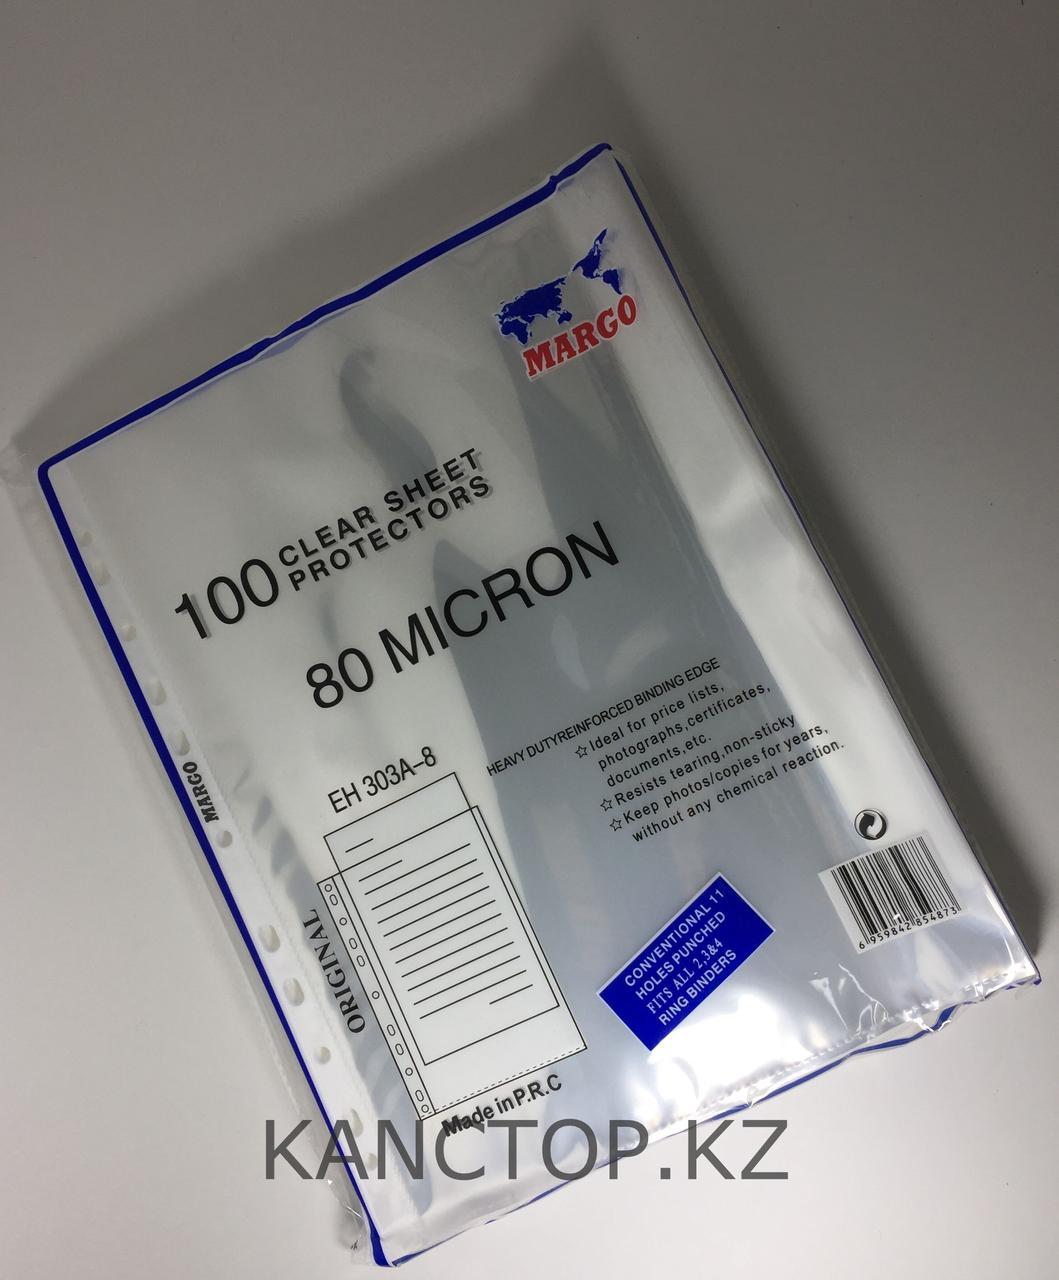 Файл - вкладыш А4 MARGO 80 мкр прозрачный